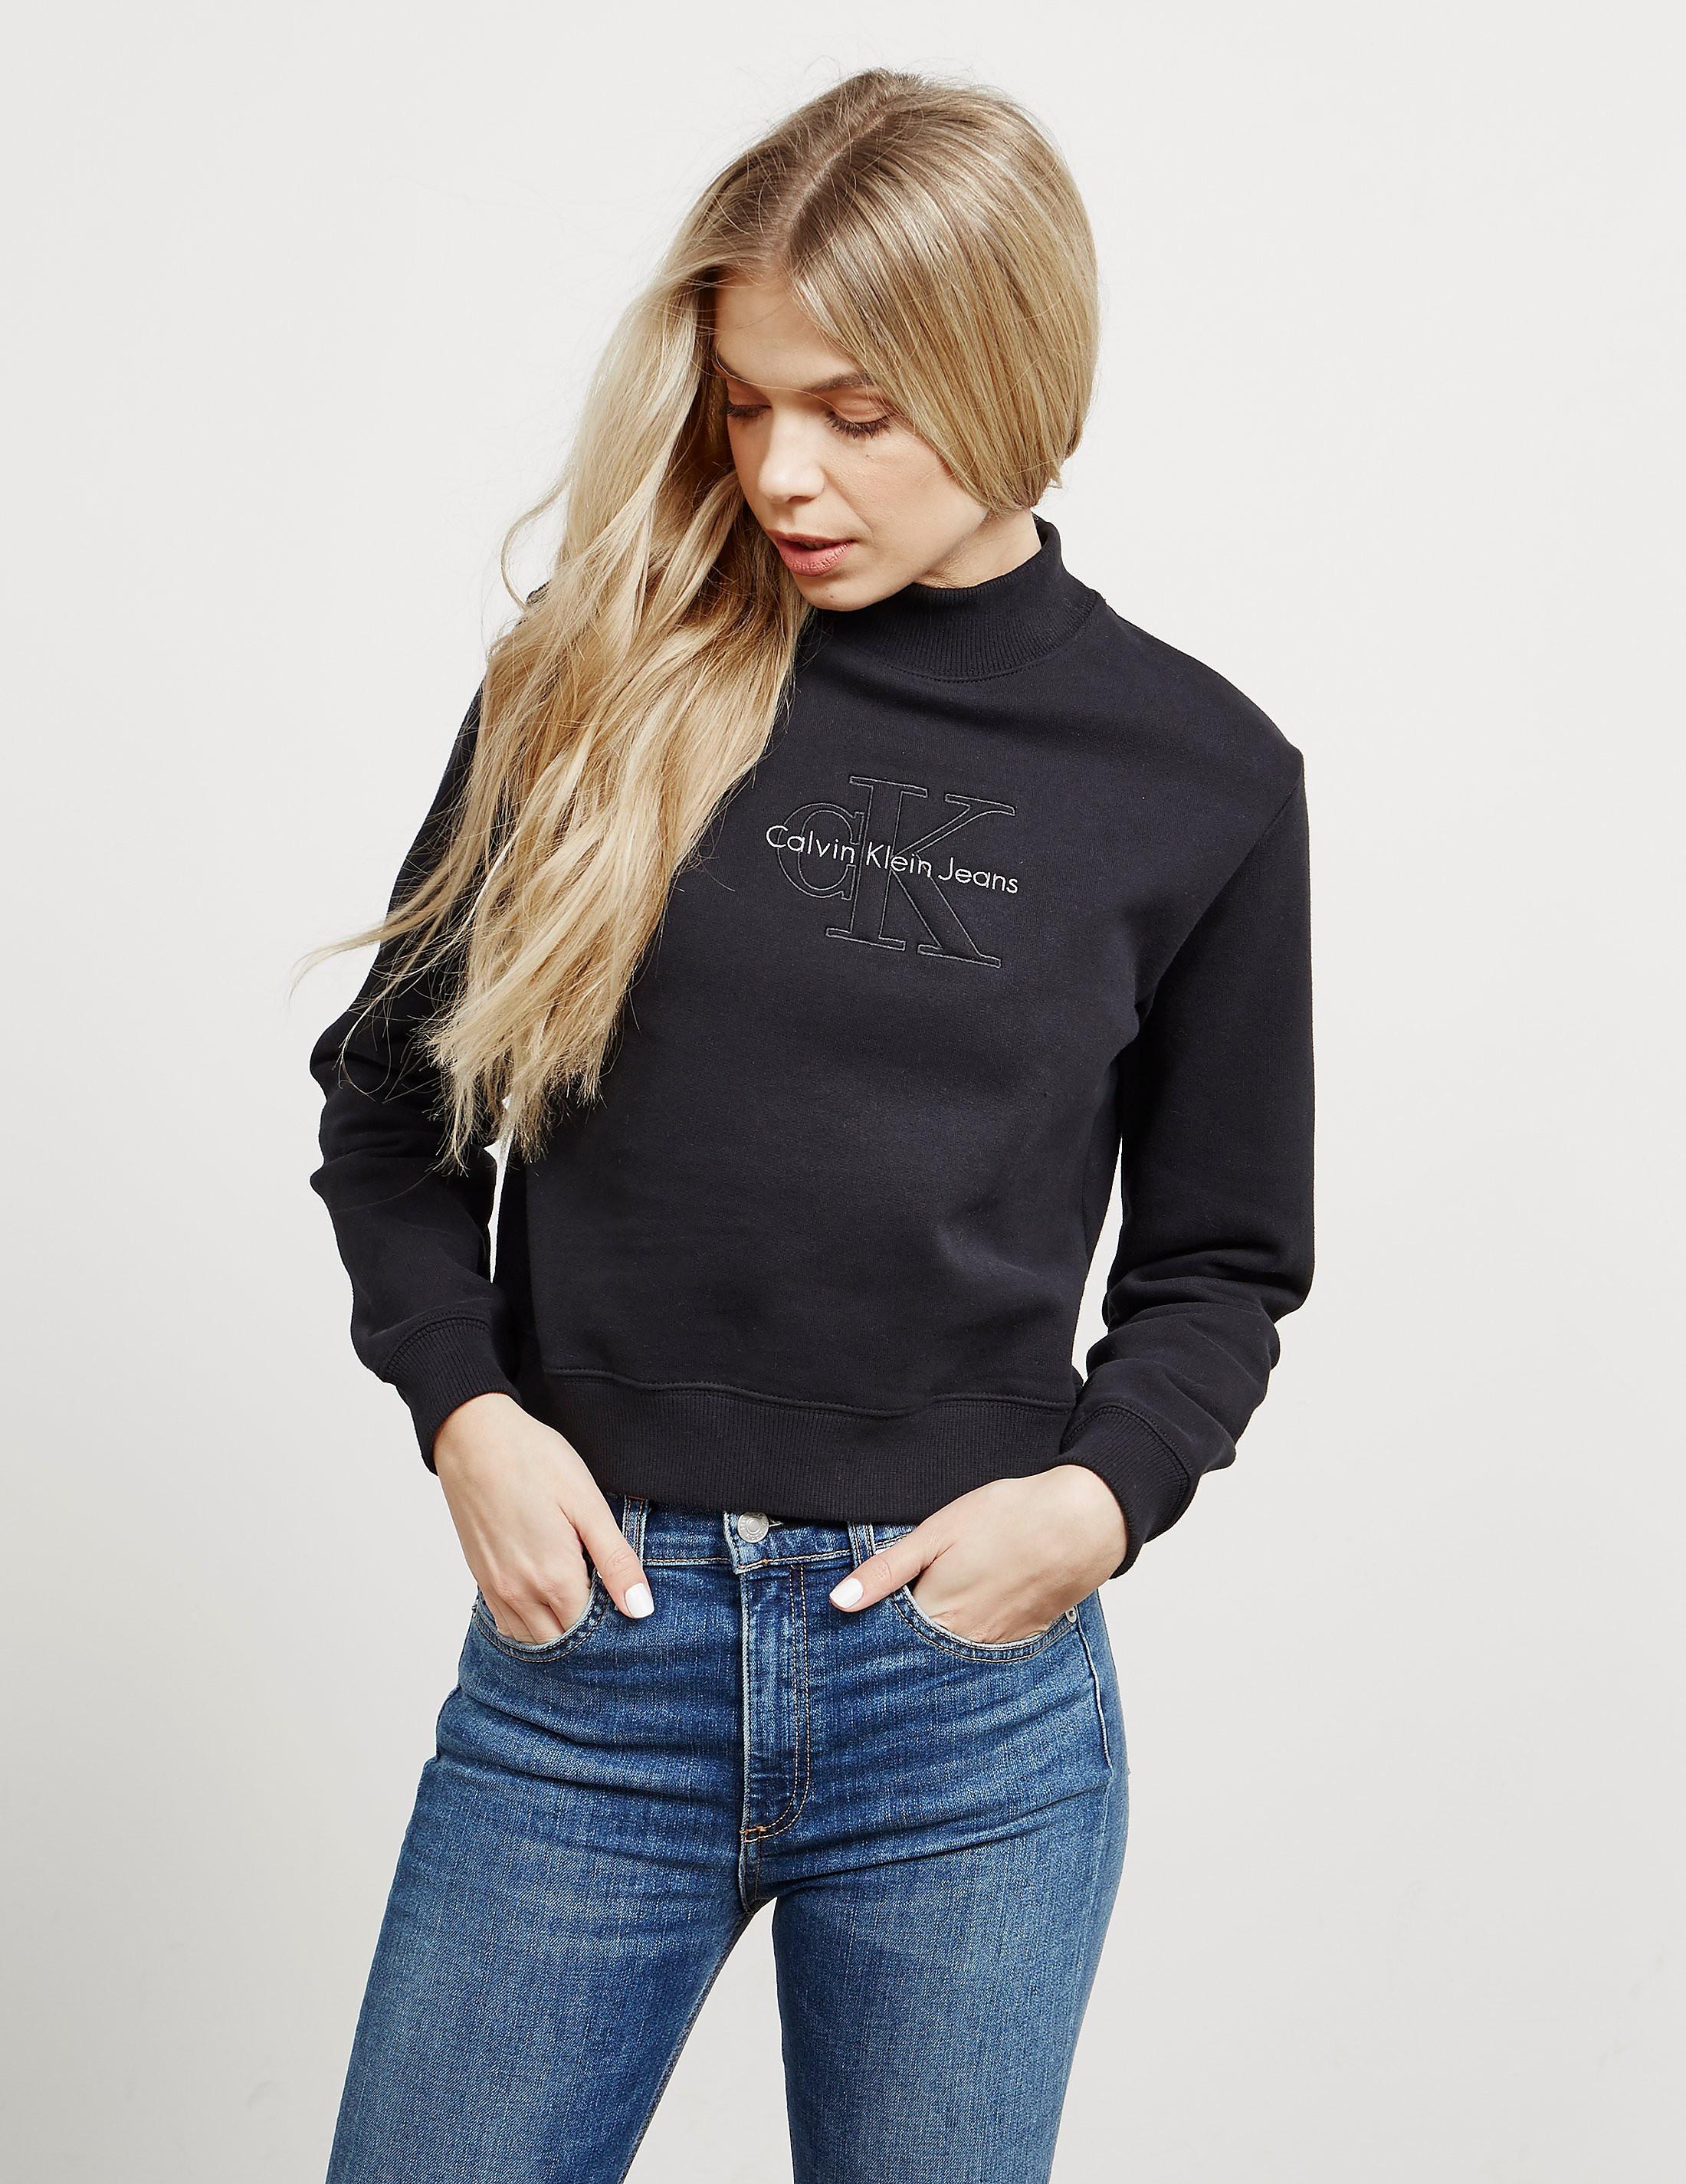 Calvin Klein Hazel Icon Sweatshirt